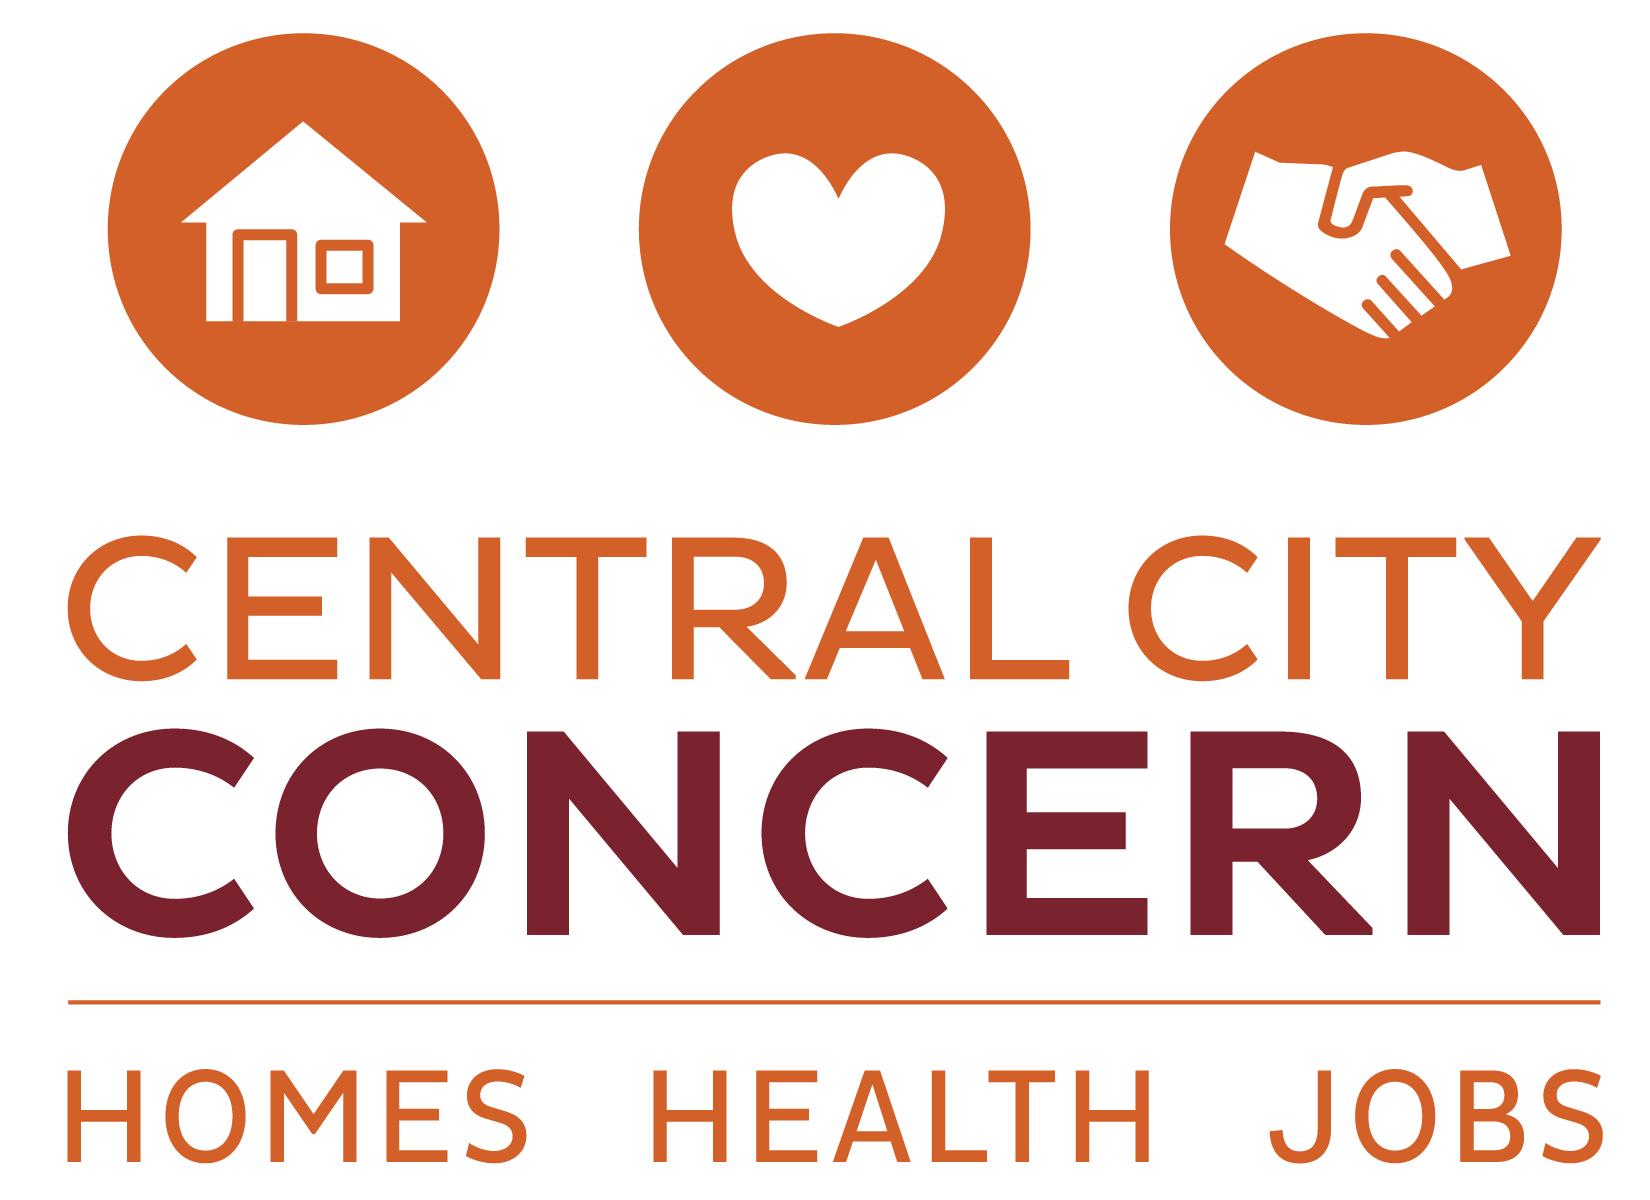 Central-City-Concern-Logo